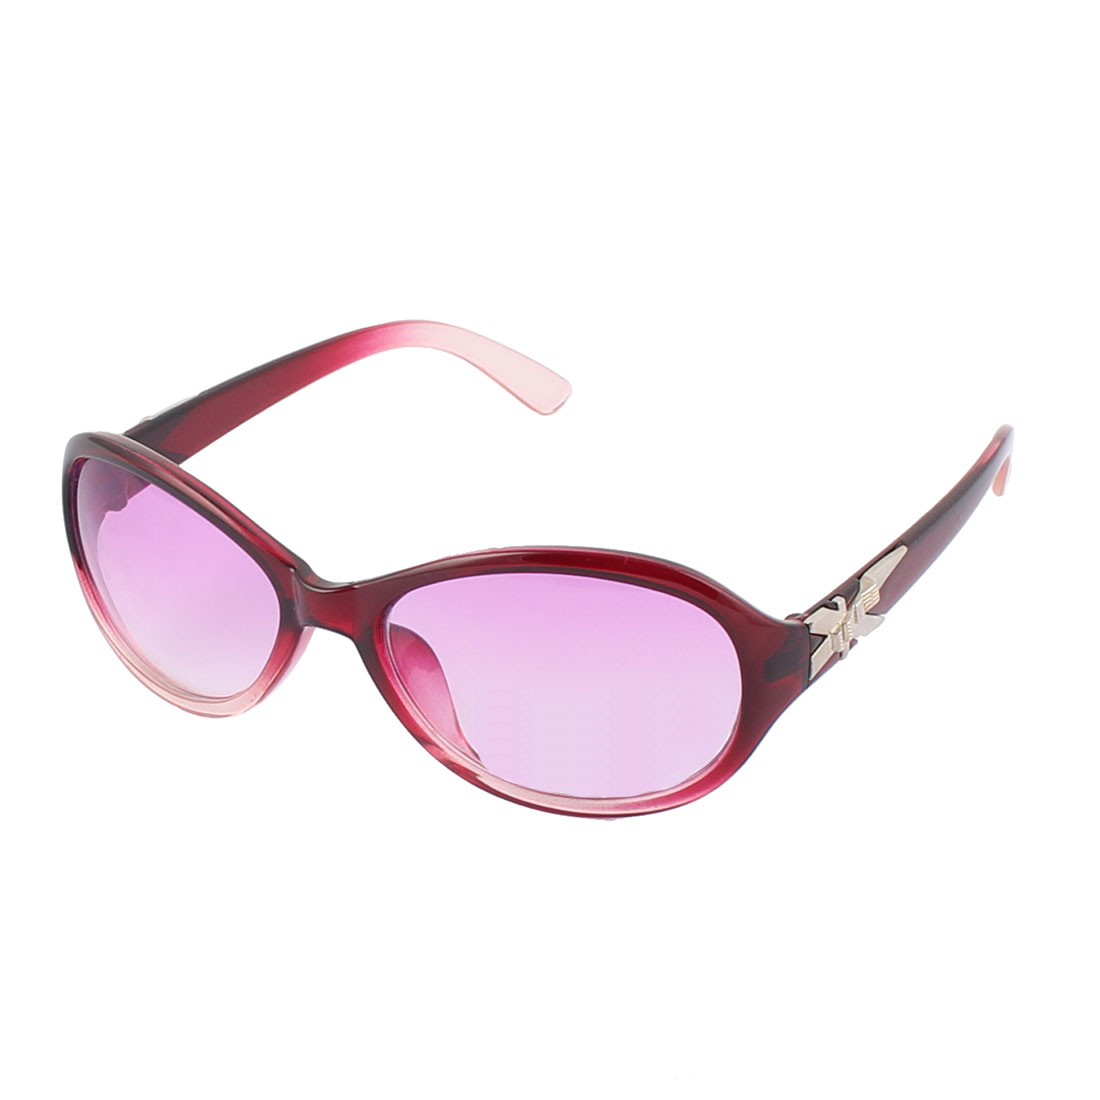 Lady Plastic Round Full Flame UV Protection Lens Sun Shield Sunglass Fuchsia